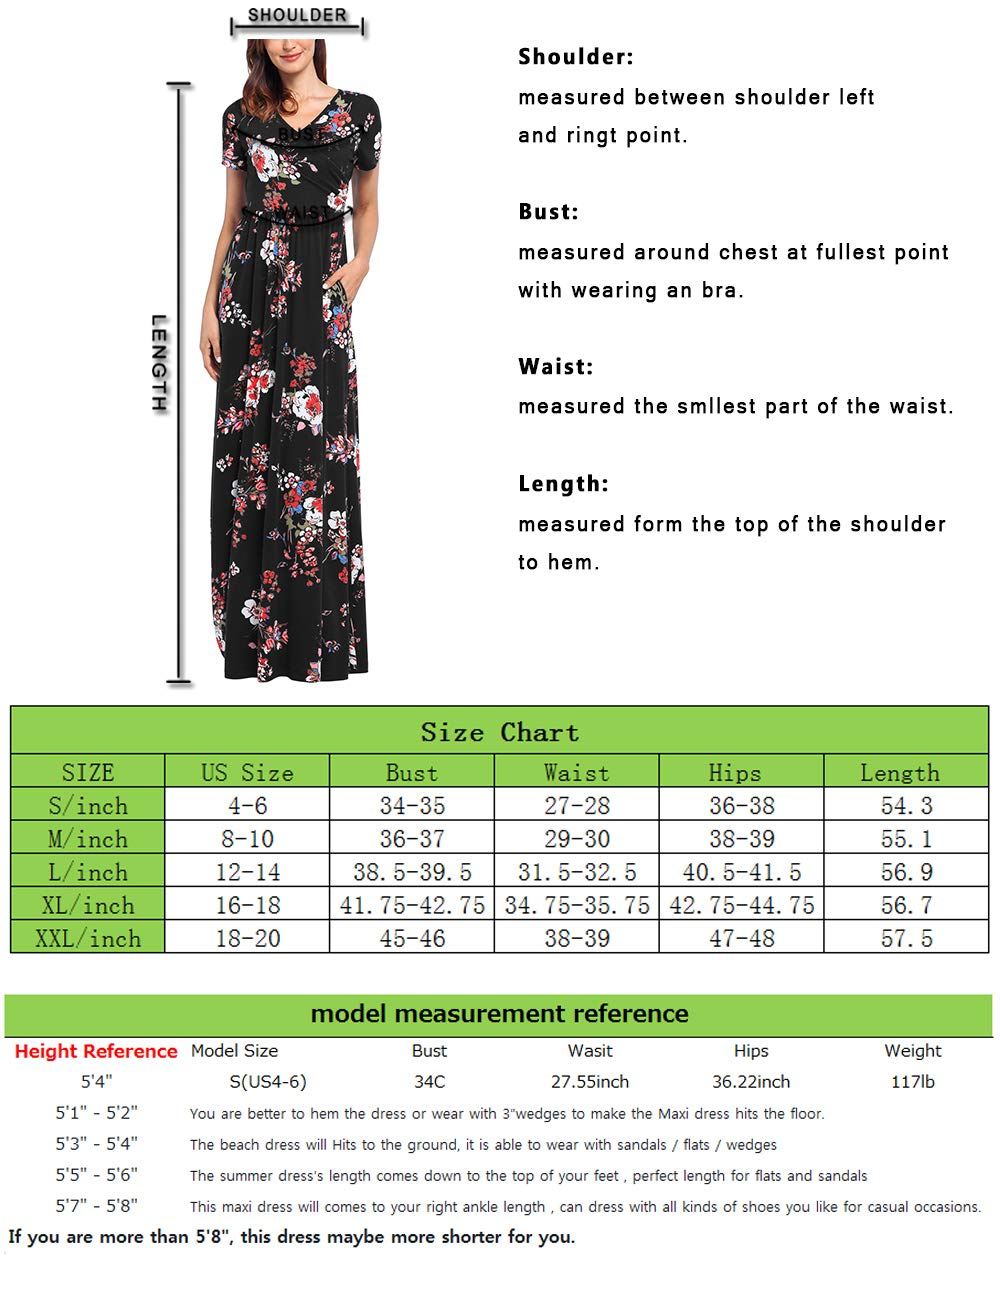 Comila Short Sleeve Maxi Dresses for Women, Summer V Neck Dress Pockets Vintage Floral Maxi Casual Dress with Pockets Elegant Work Office Long Dress Black S (US 4-6) by Comila (Image #7)